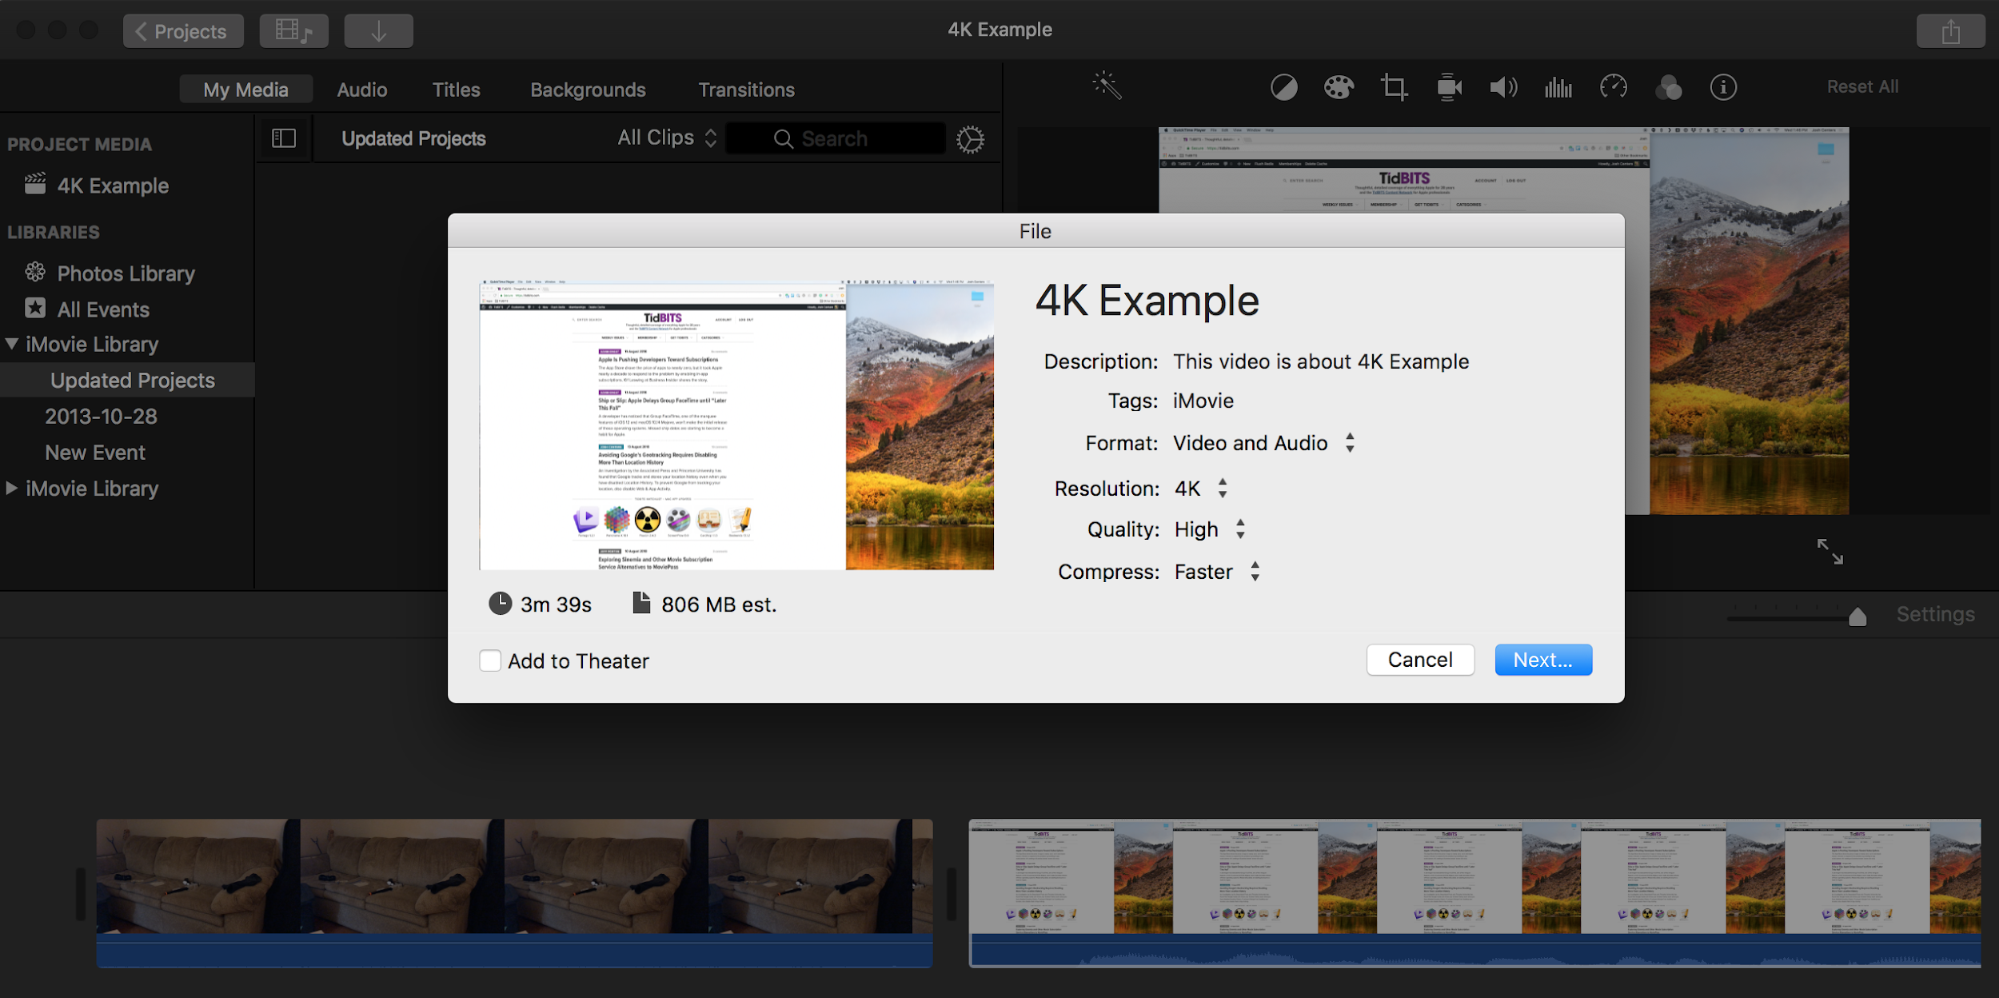 TipBITS: Make iMovie Output Full-Resolution Video - TidBITS